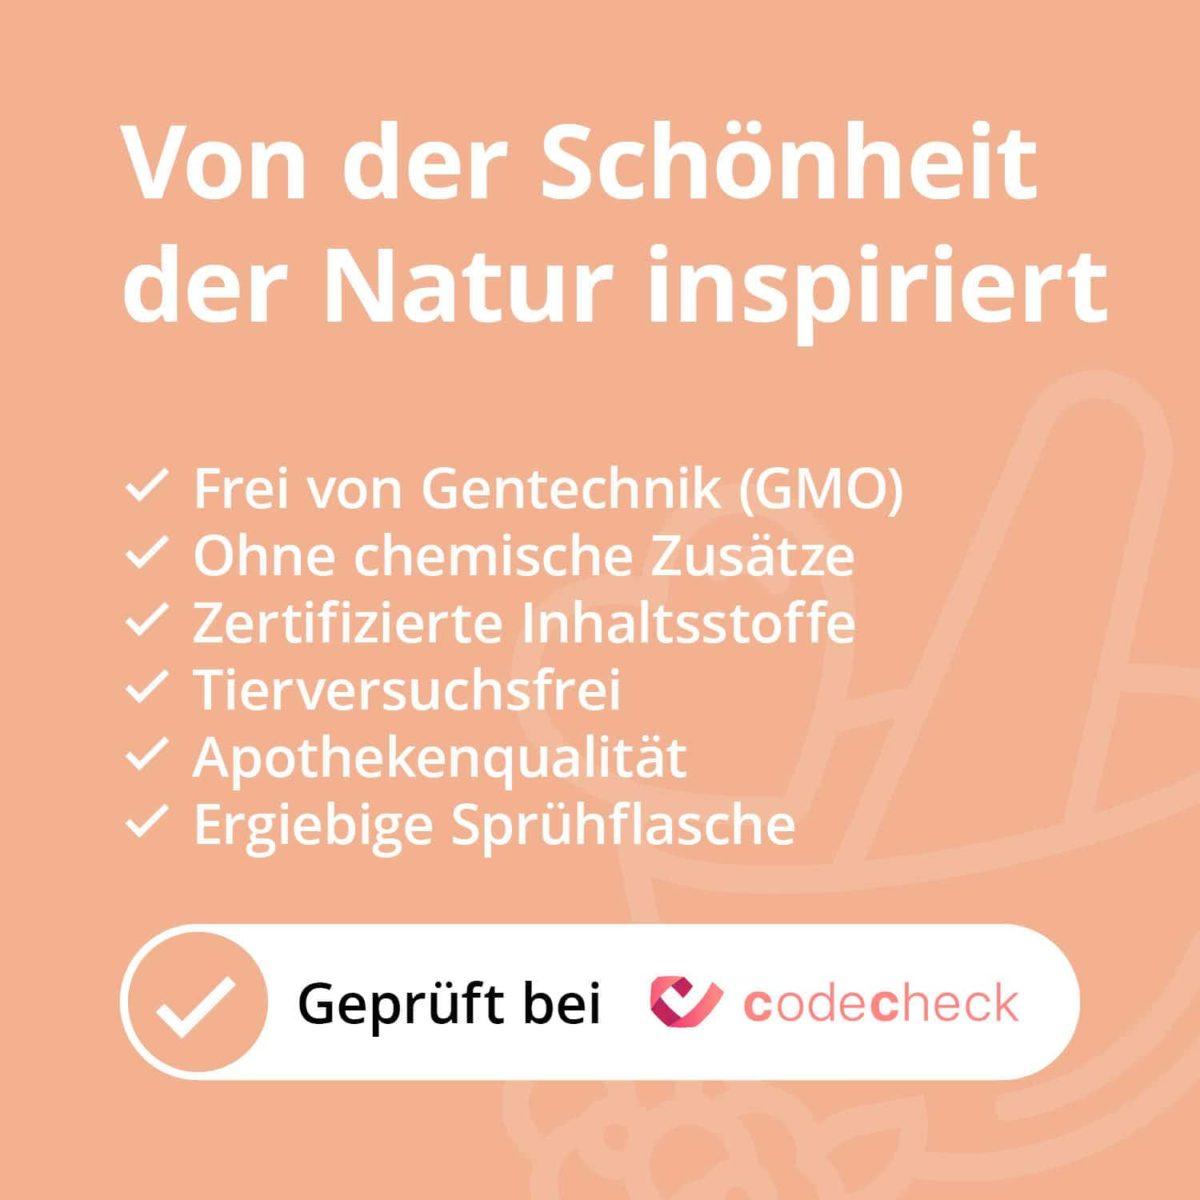 Casida Mizellenwasser Kamille Natural – 150 ml 15408238 PZN Apotheke Abschminken Make-up pflanzlich5